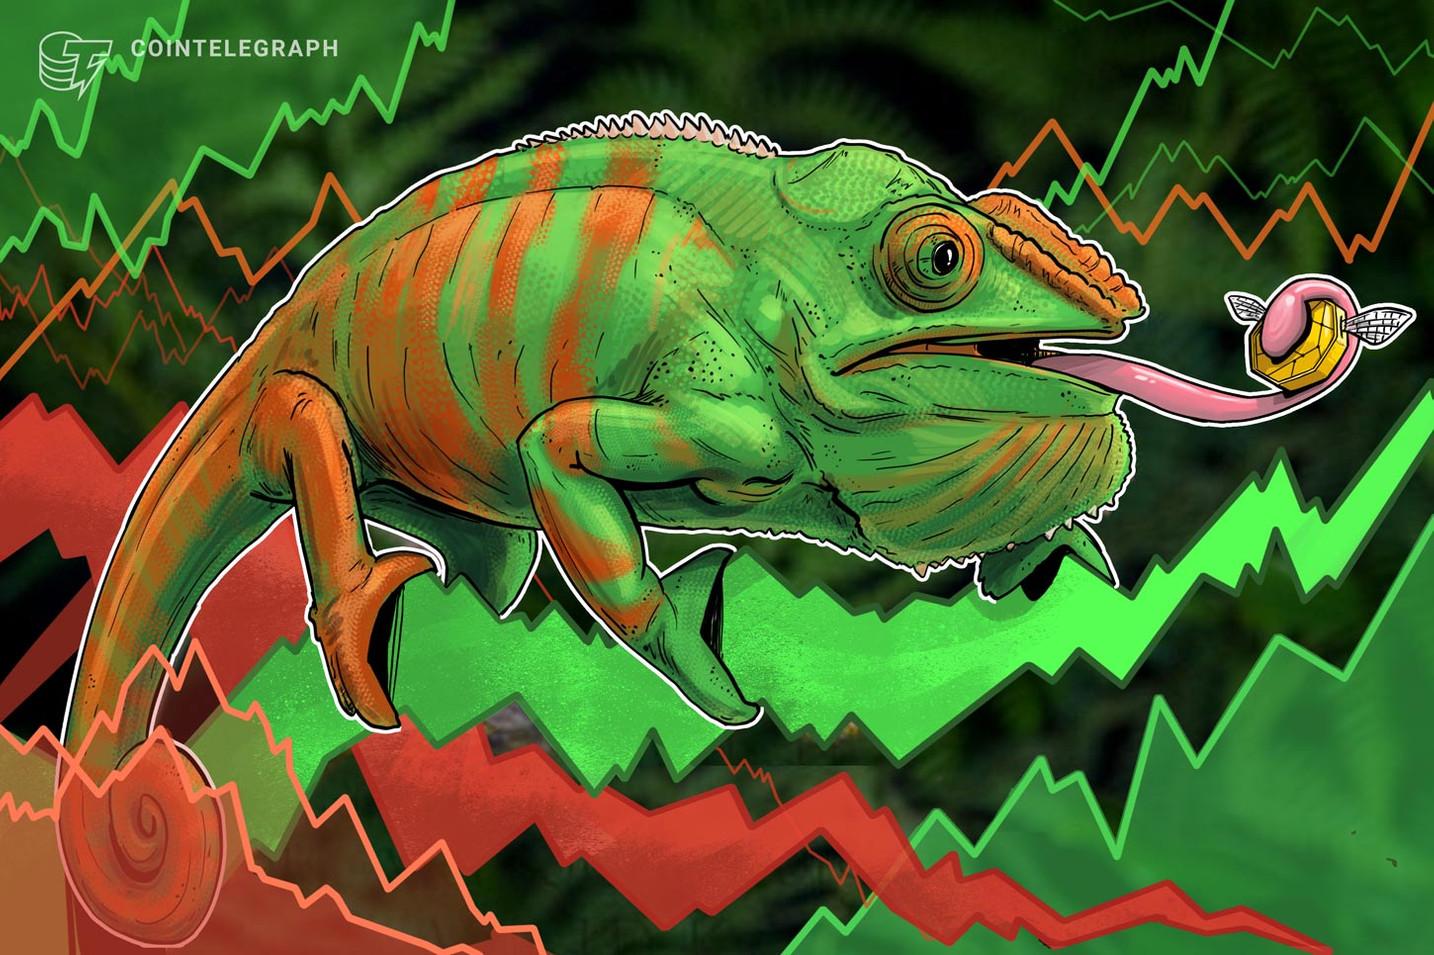 Crypto Markets Turning Green, Oil Prices Tumble